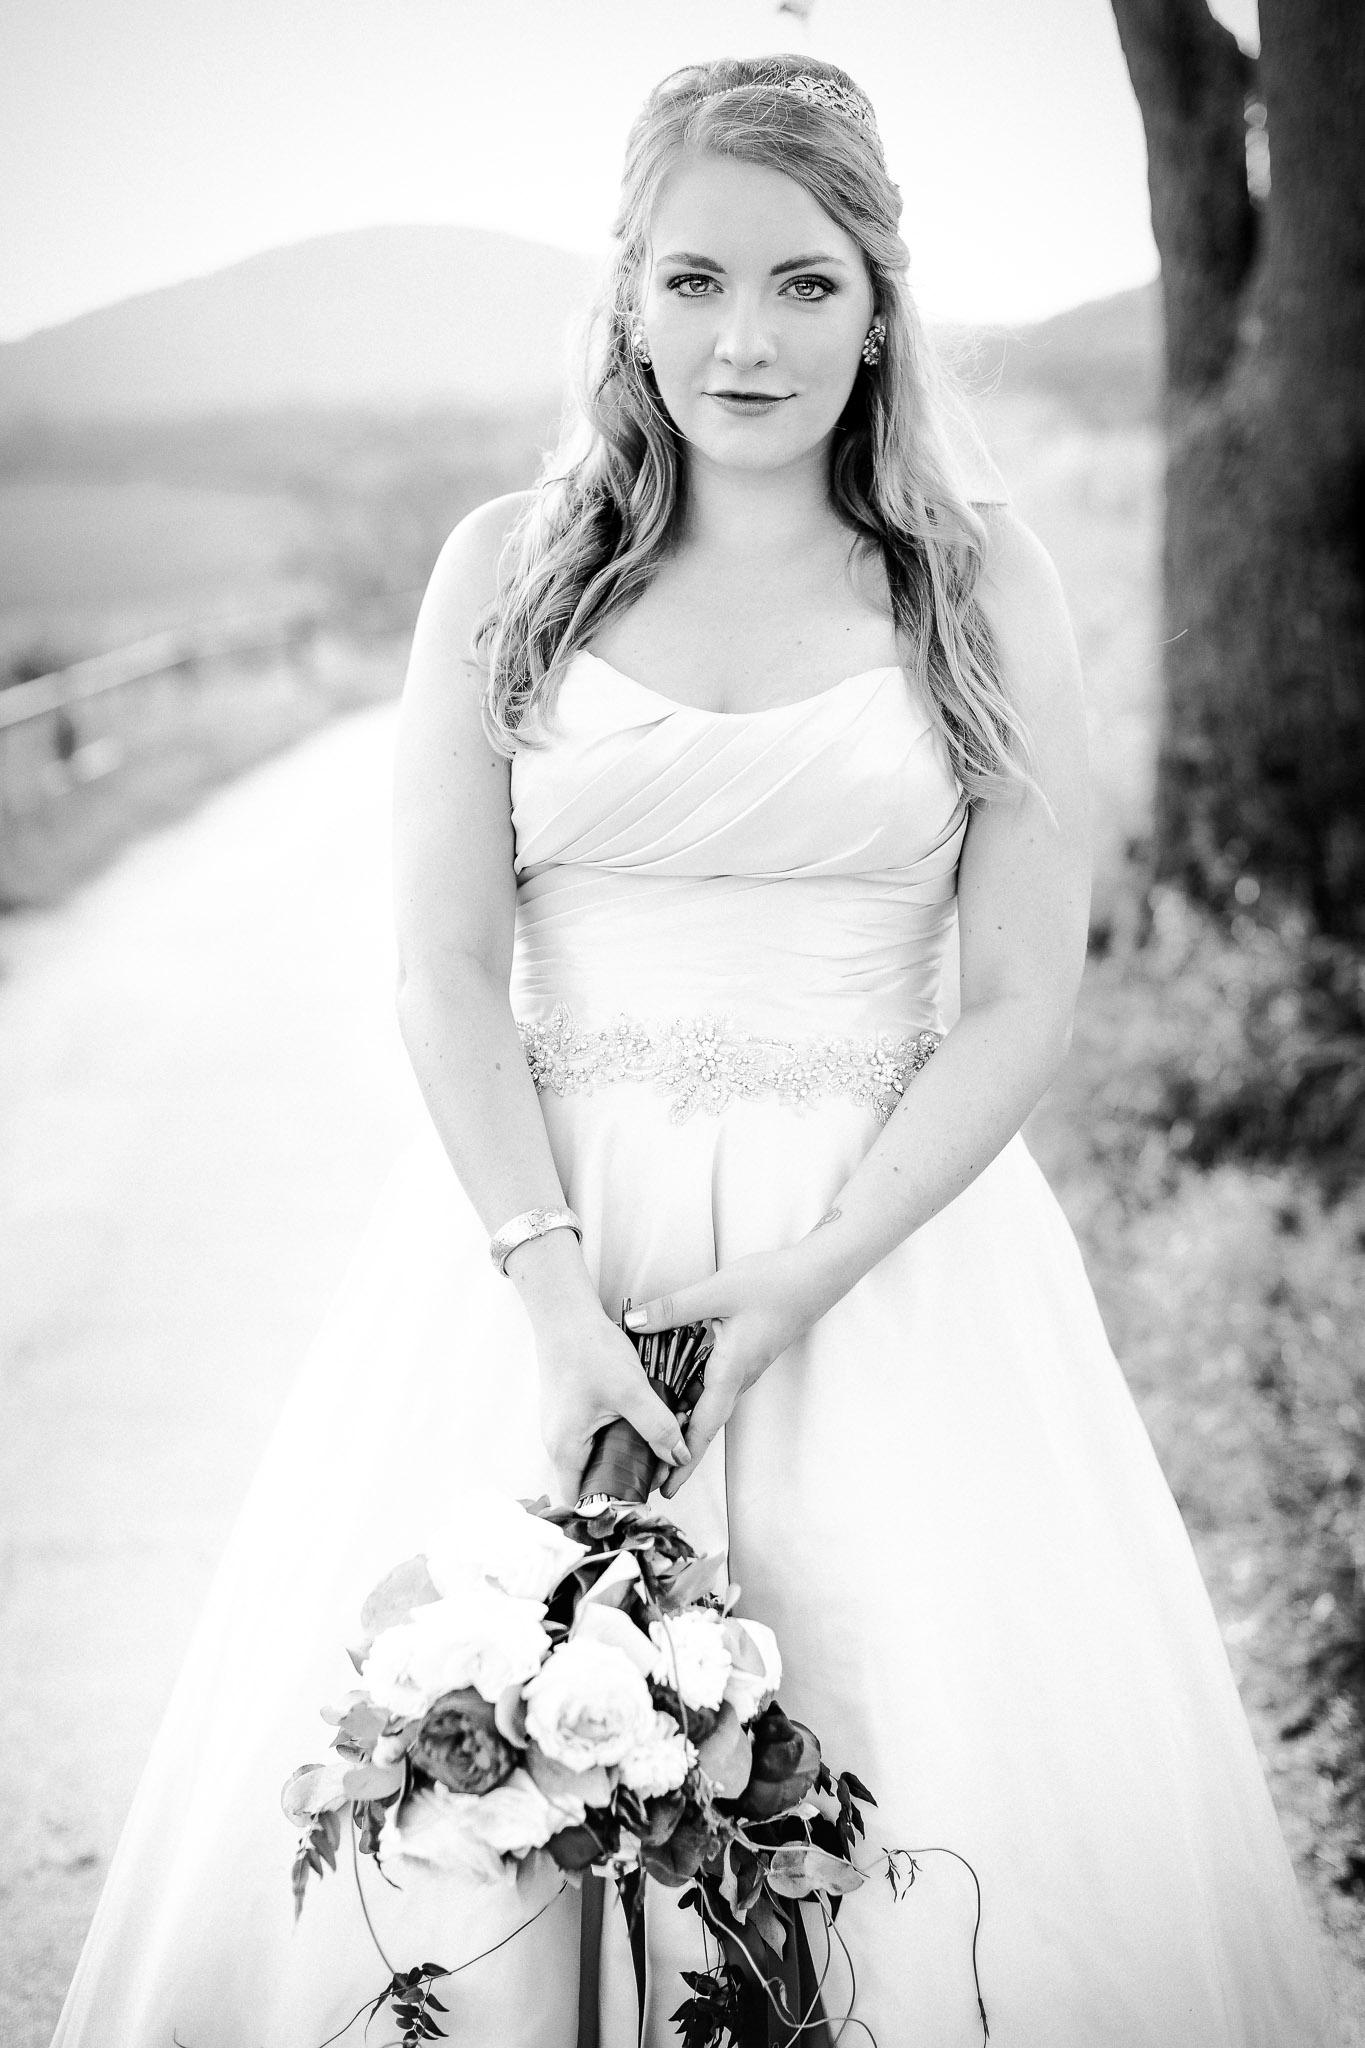 (c) Miriam & Manuel Photography